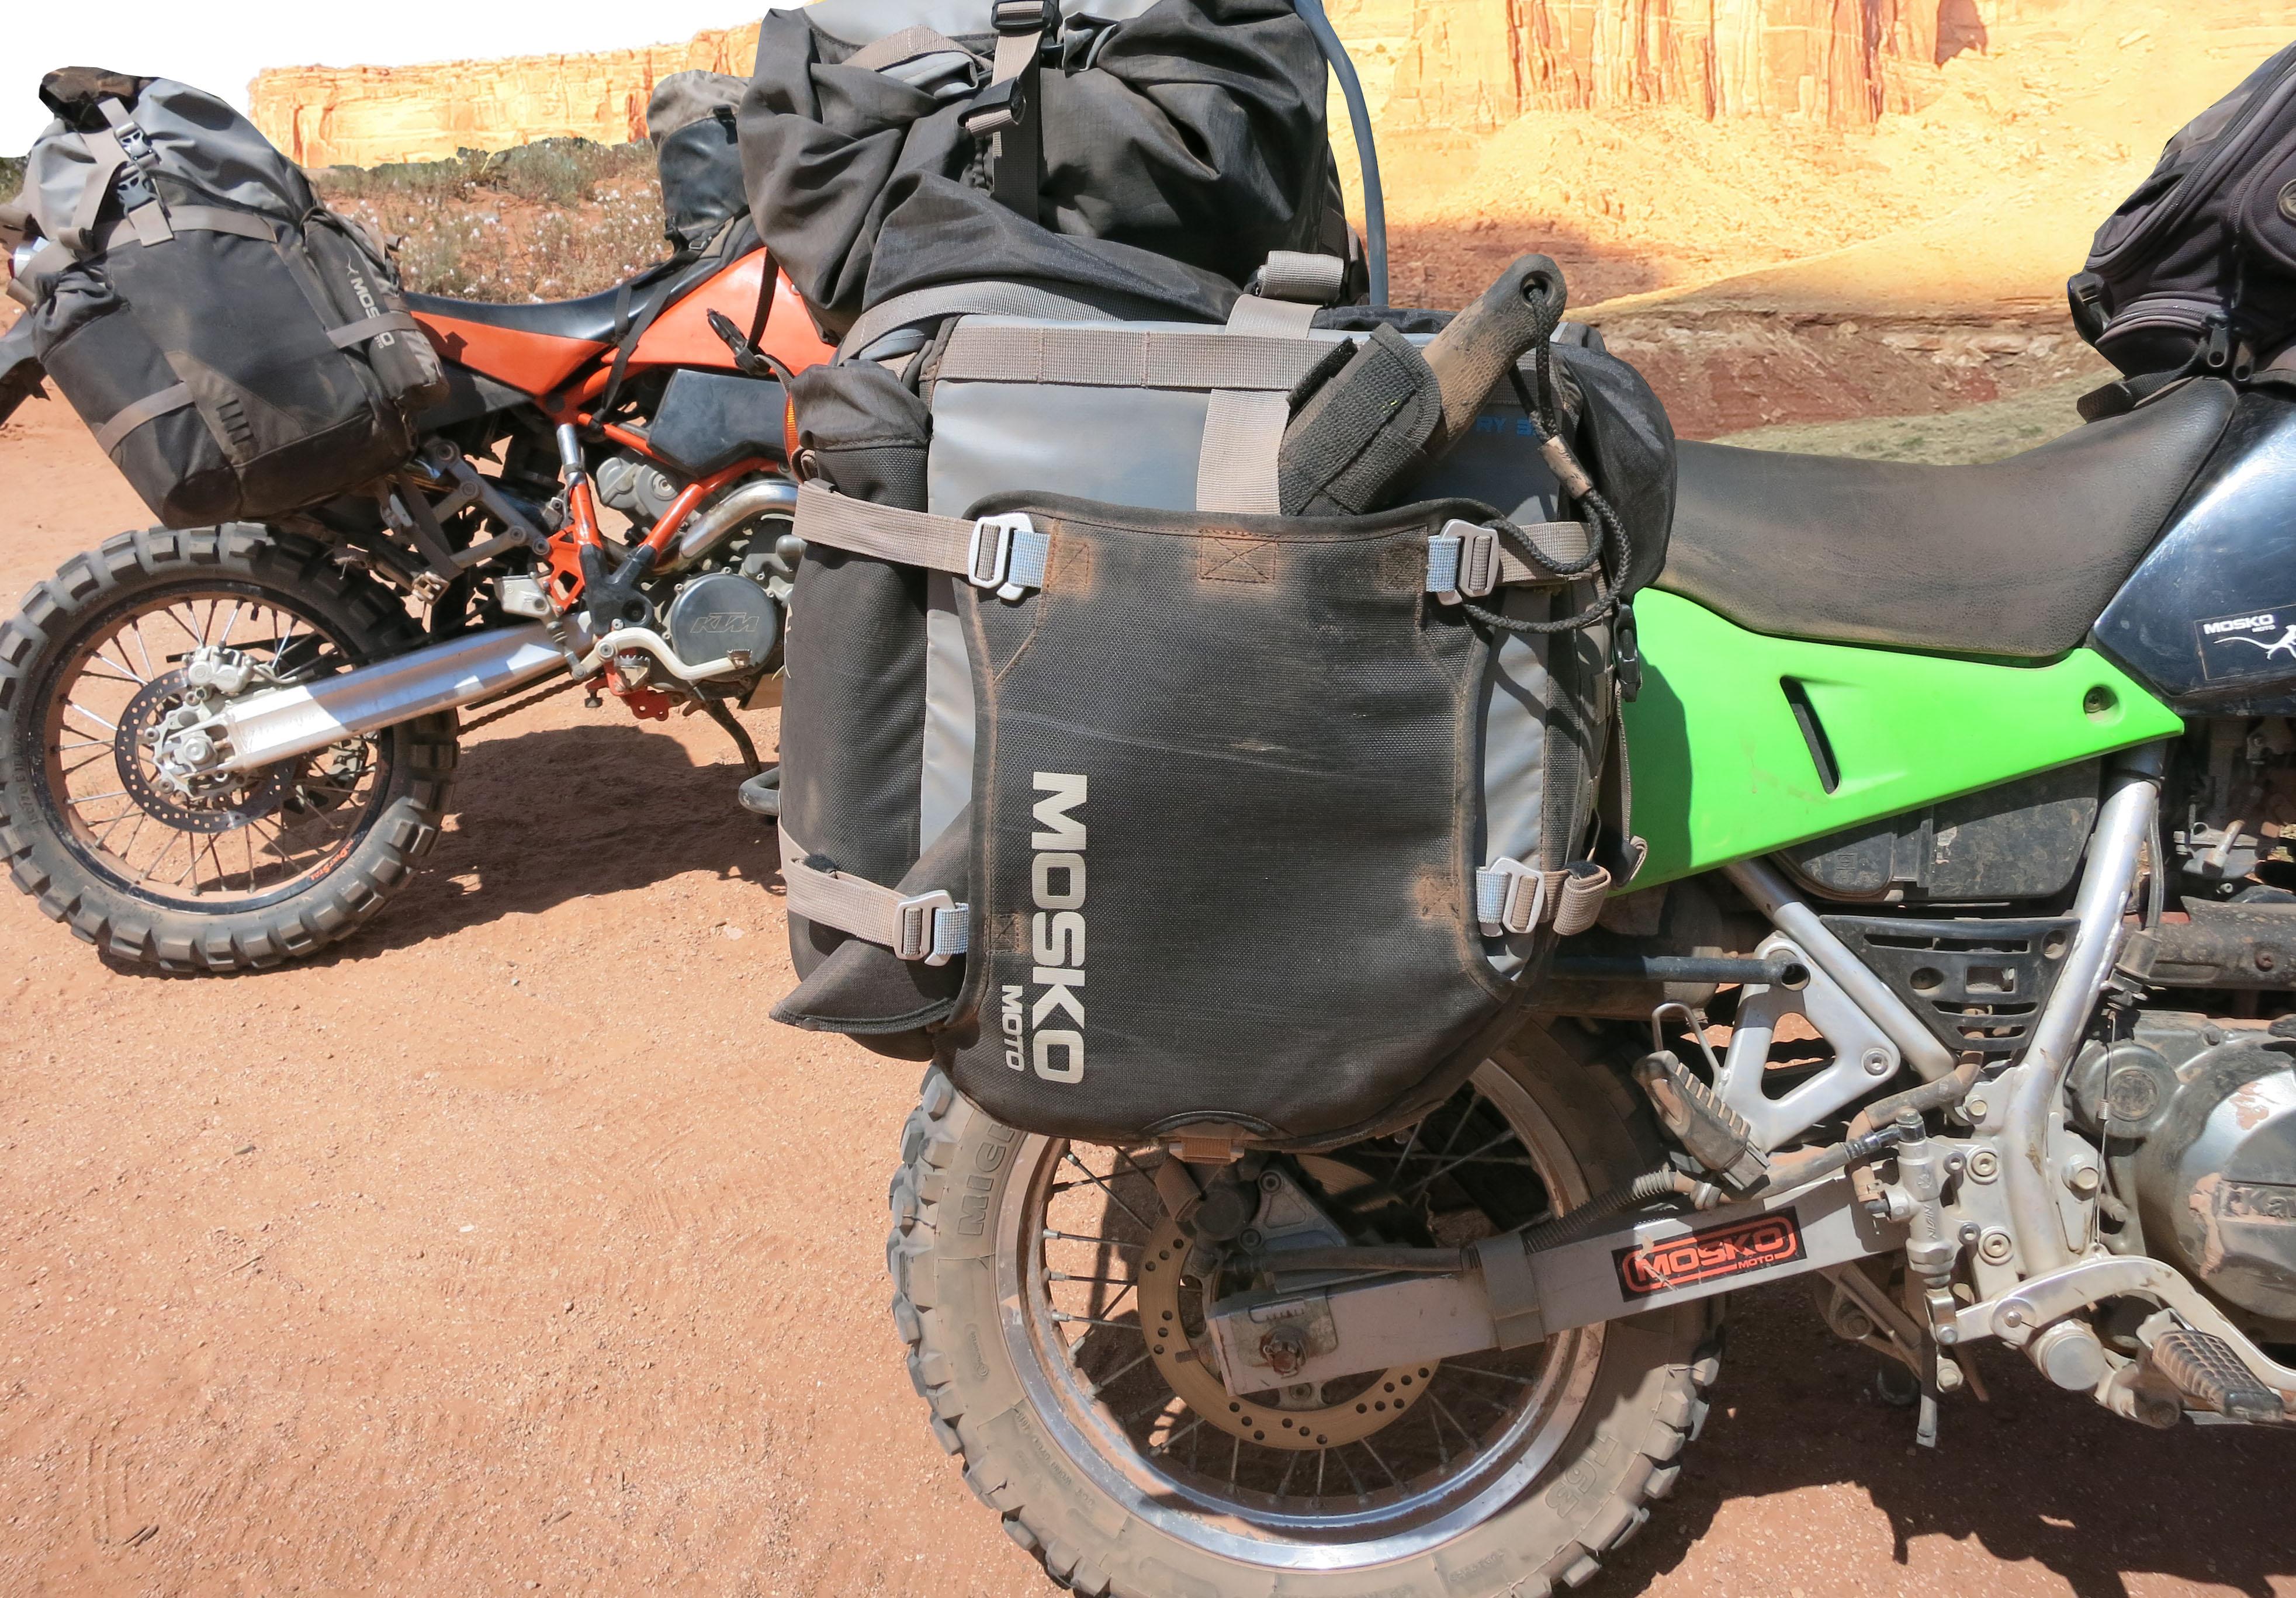 Moab crash testing mosko moto for Motor cycle saddle bags